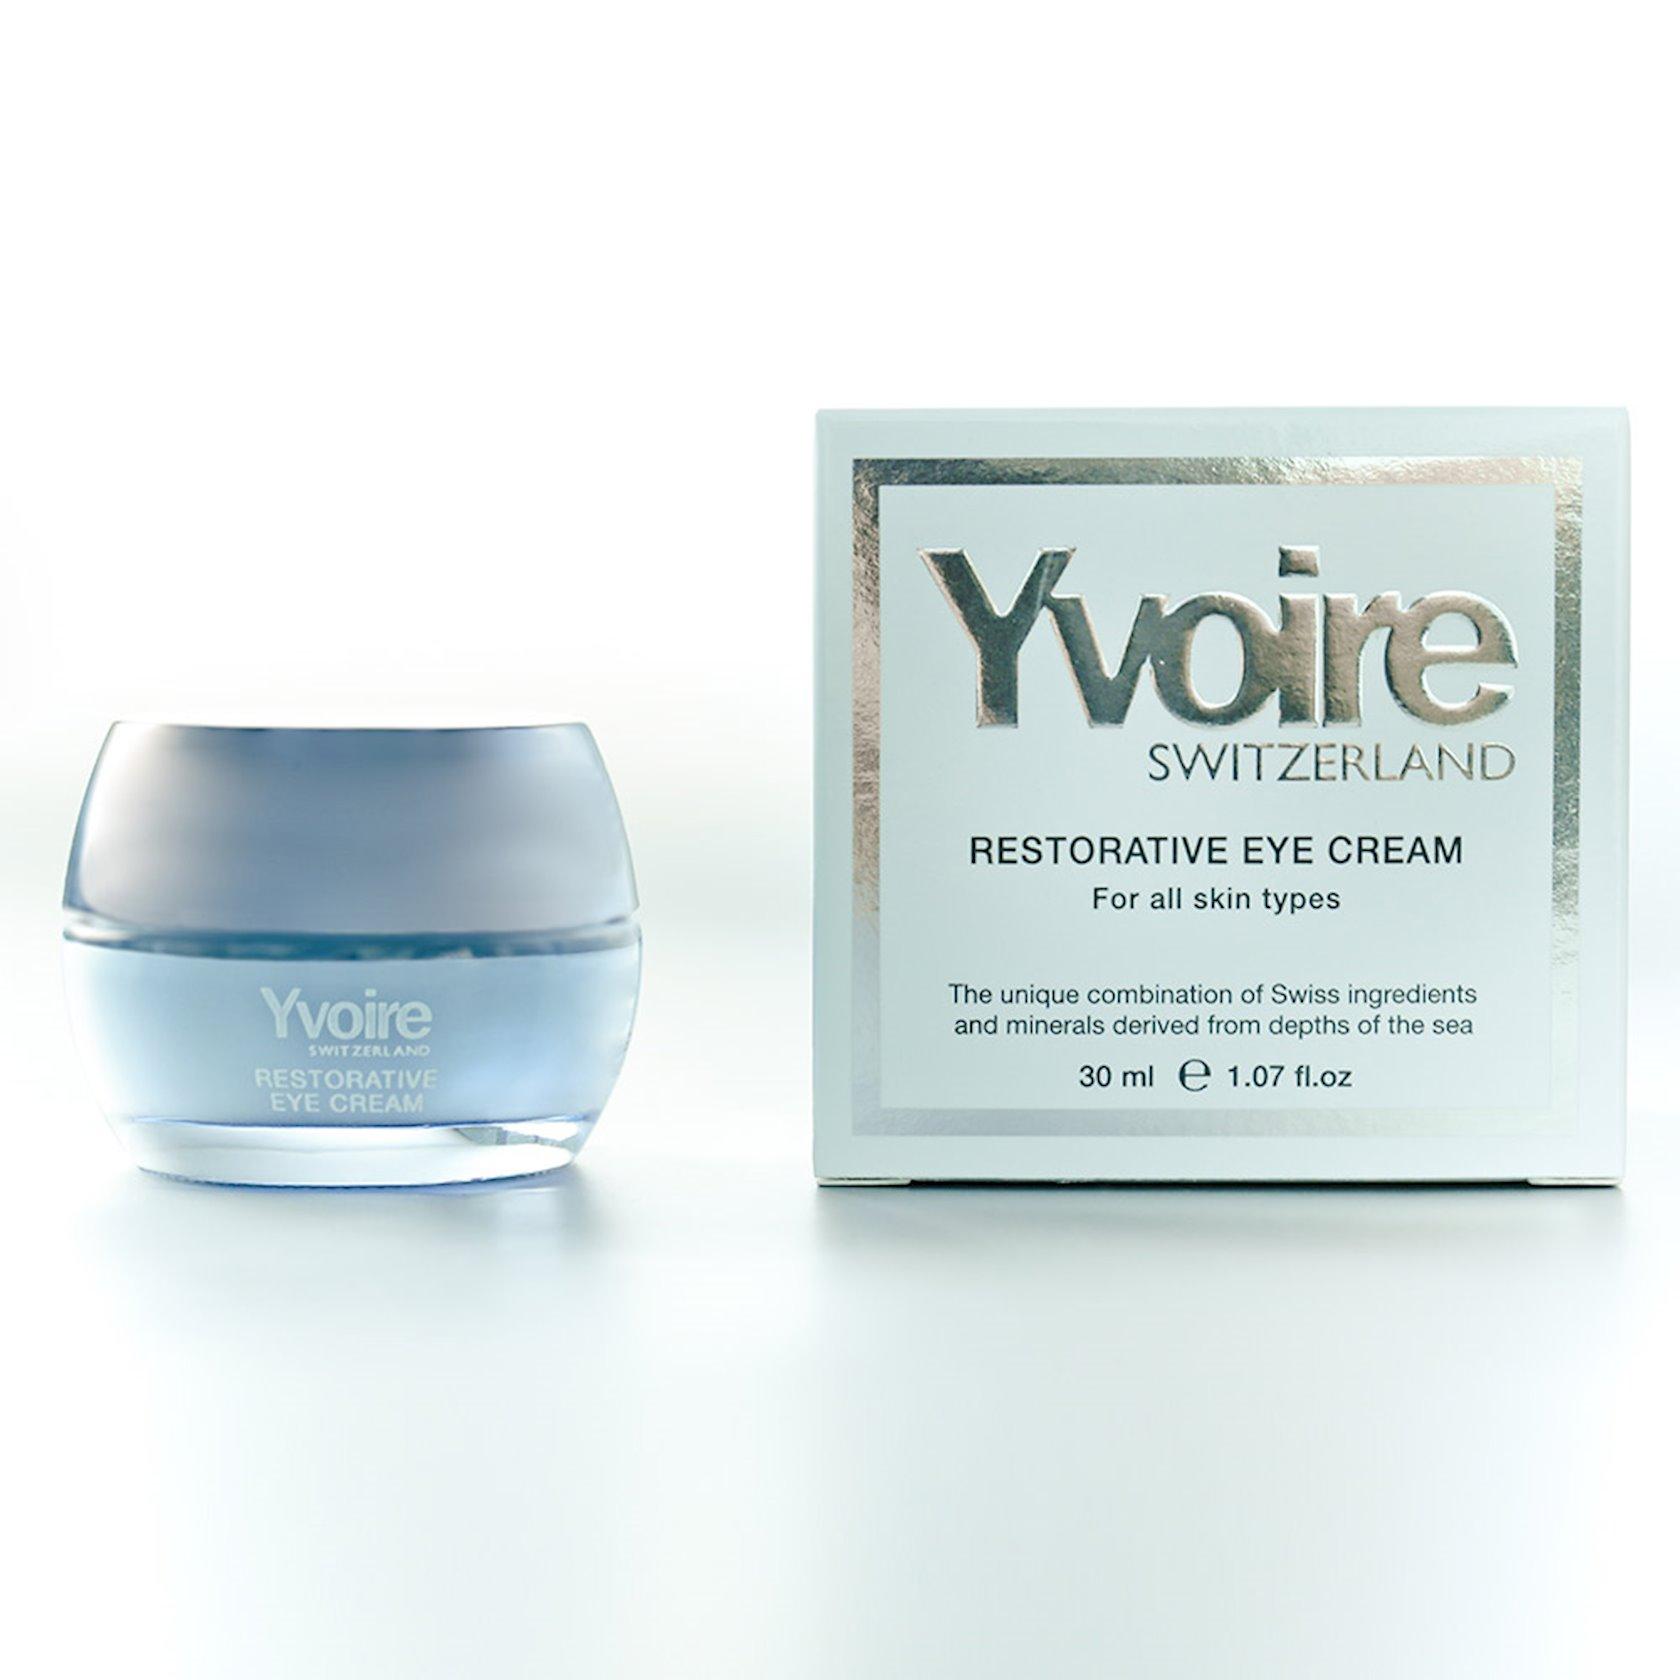 Bərpaedici göz kremi Yvoire Restorative Eye Cream 30 ml